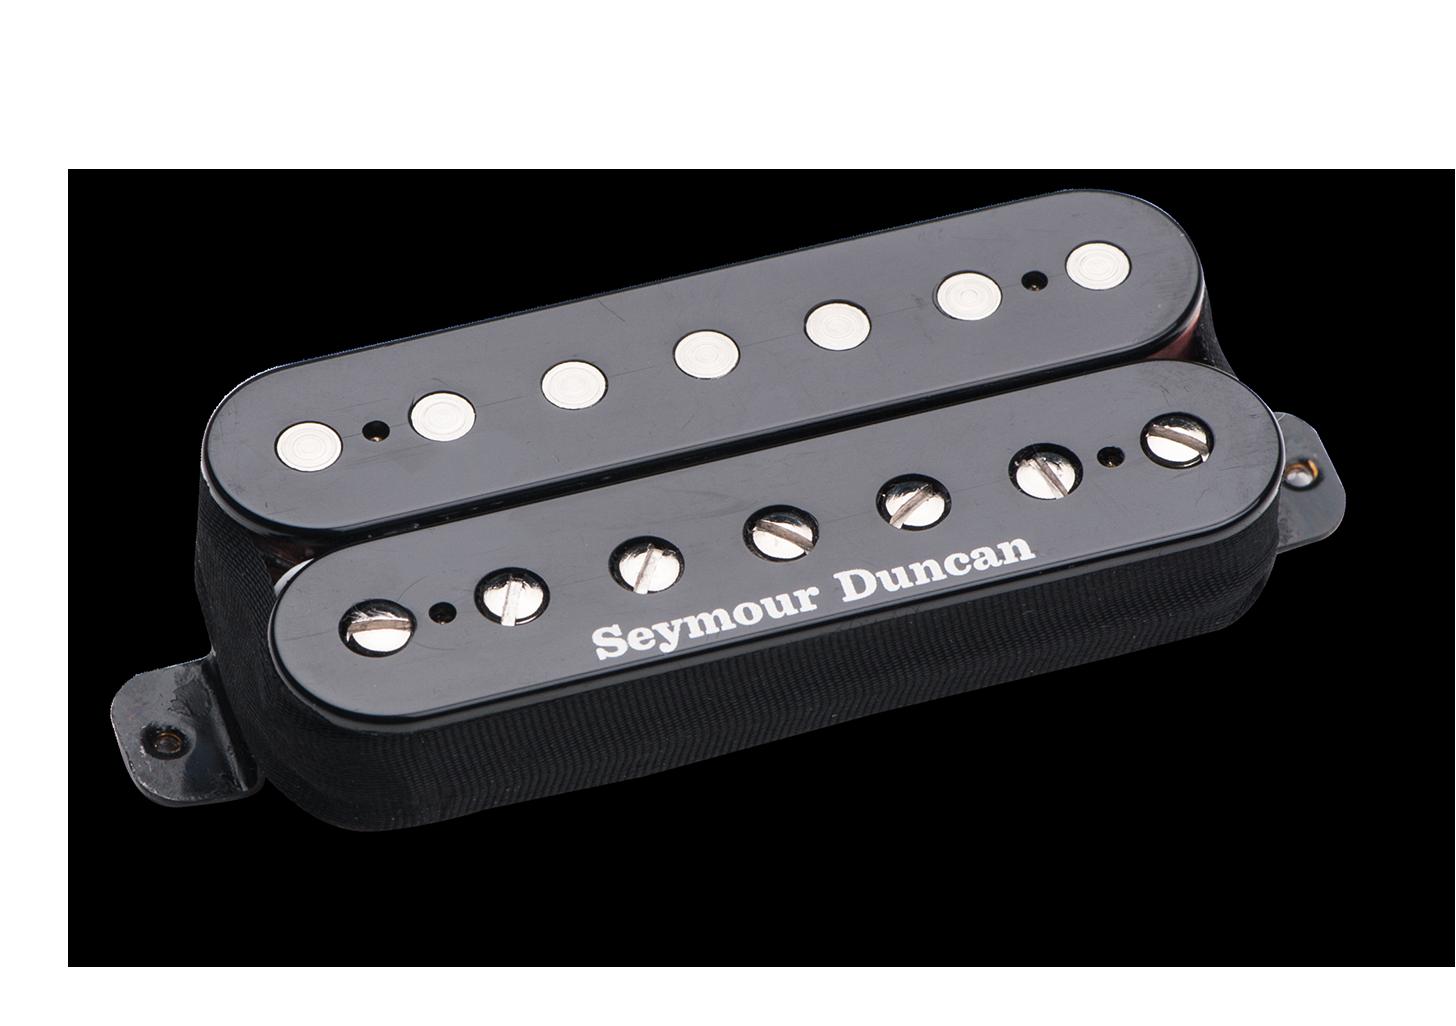 Seymour Duncan Duncan Custom Humbucker - SH-5 7-String Neck - Black